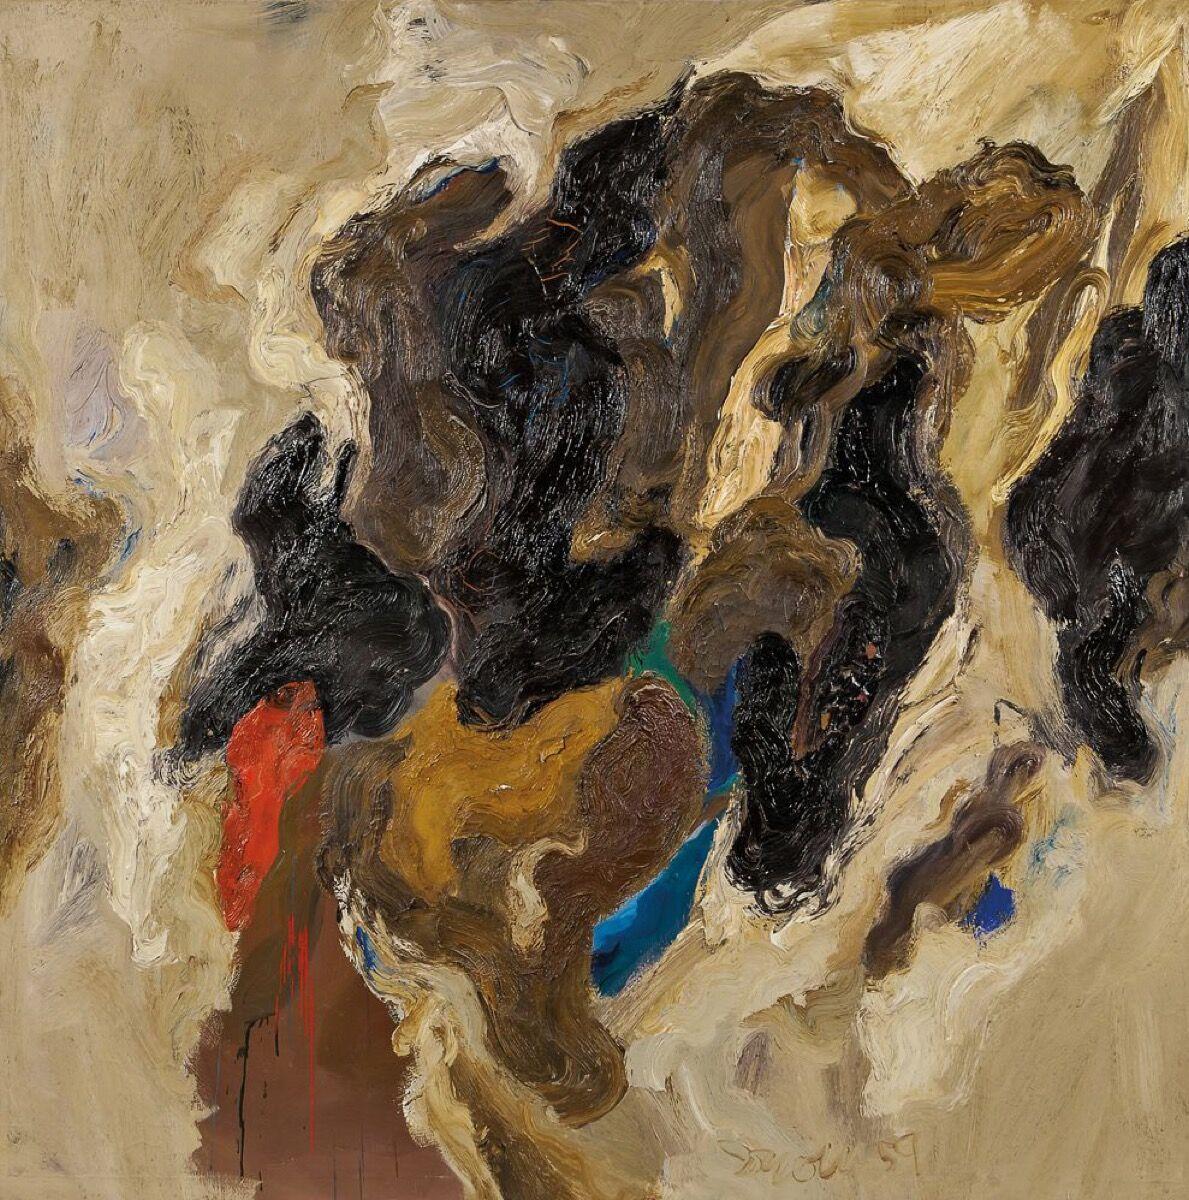 Robert Irwin, Daisetz, 1959. Courtesy of Kasmin Gallery.